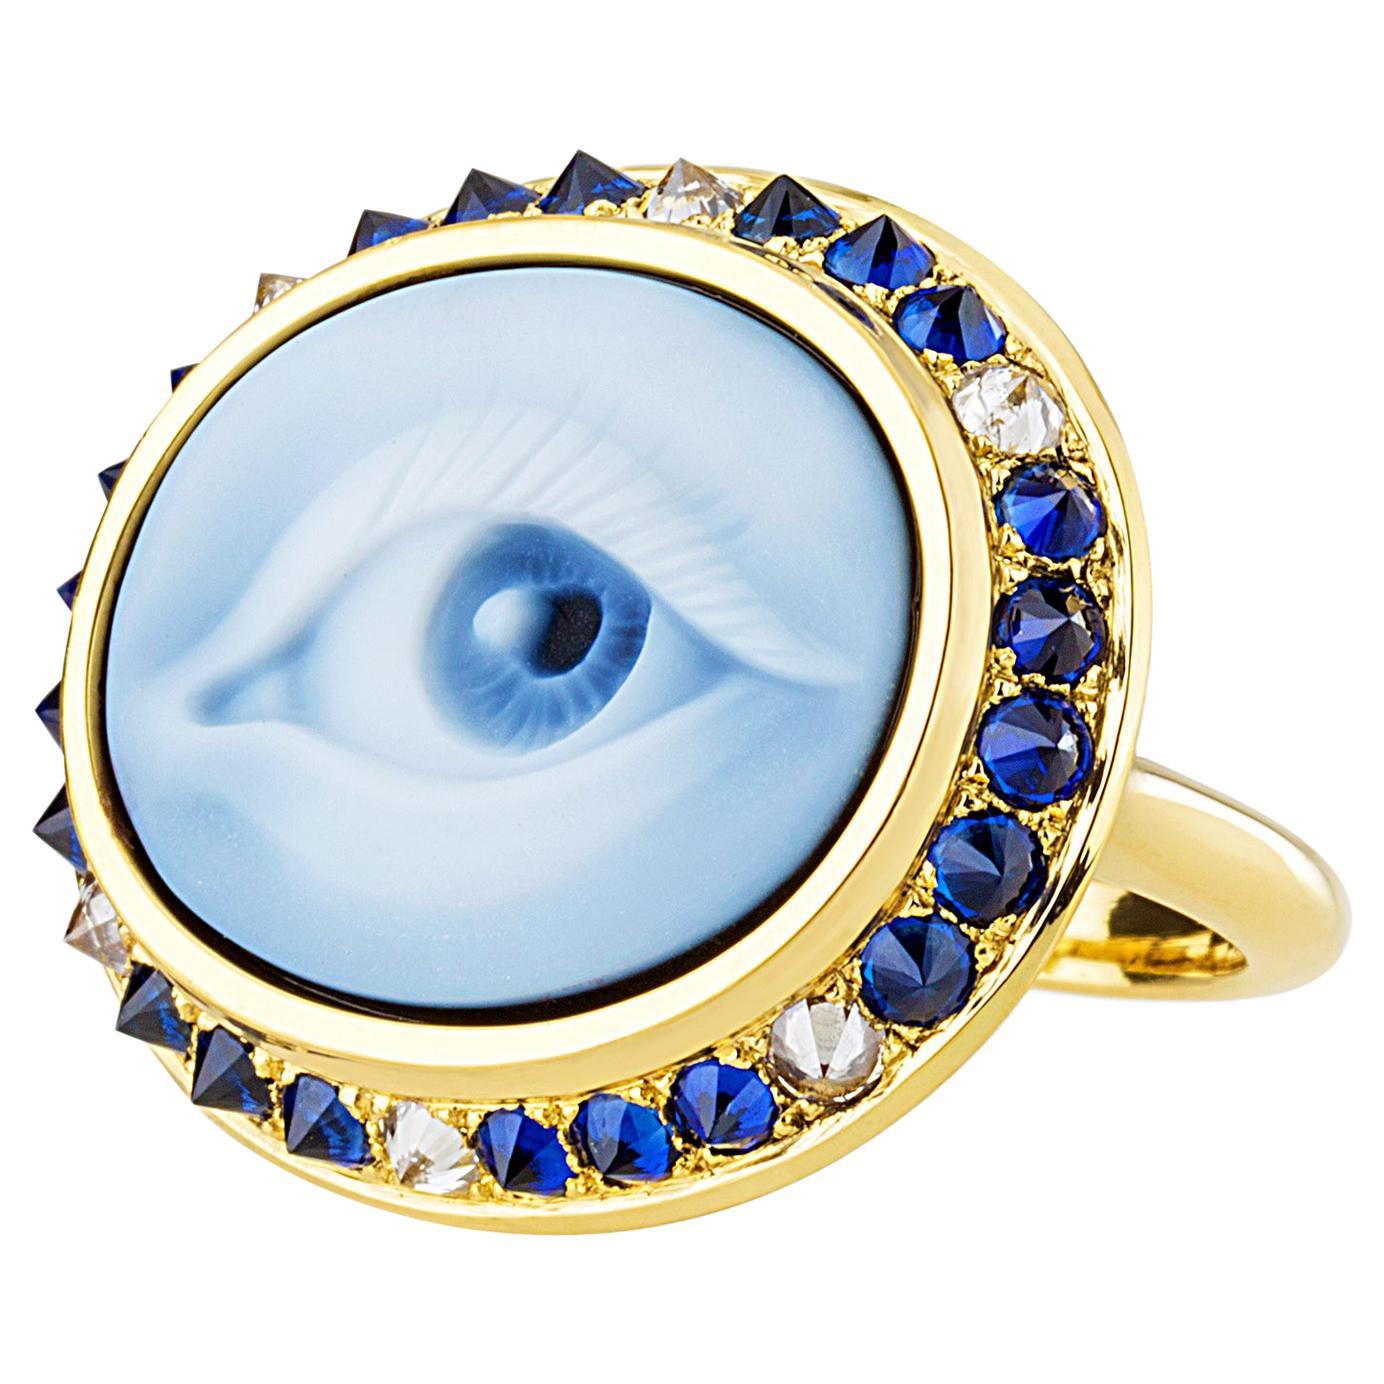 AnaKatarina Customizable Agate, Sapphire, Diamond, Gold 'Lover's Eye' Cameo Ring